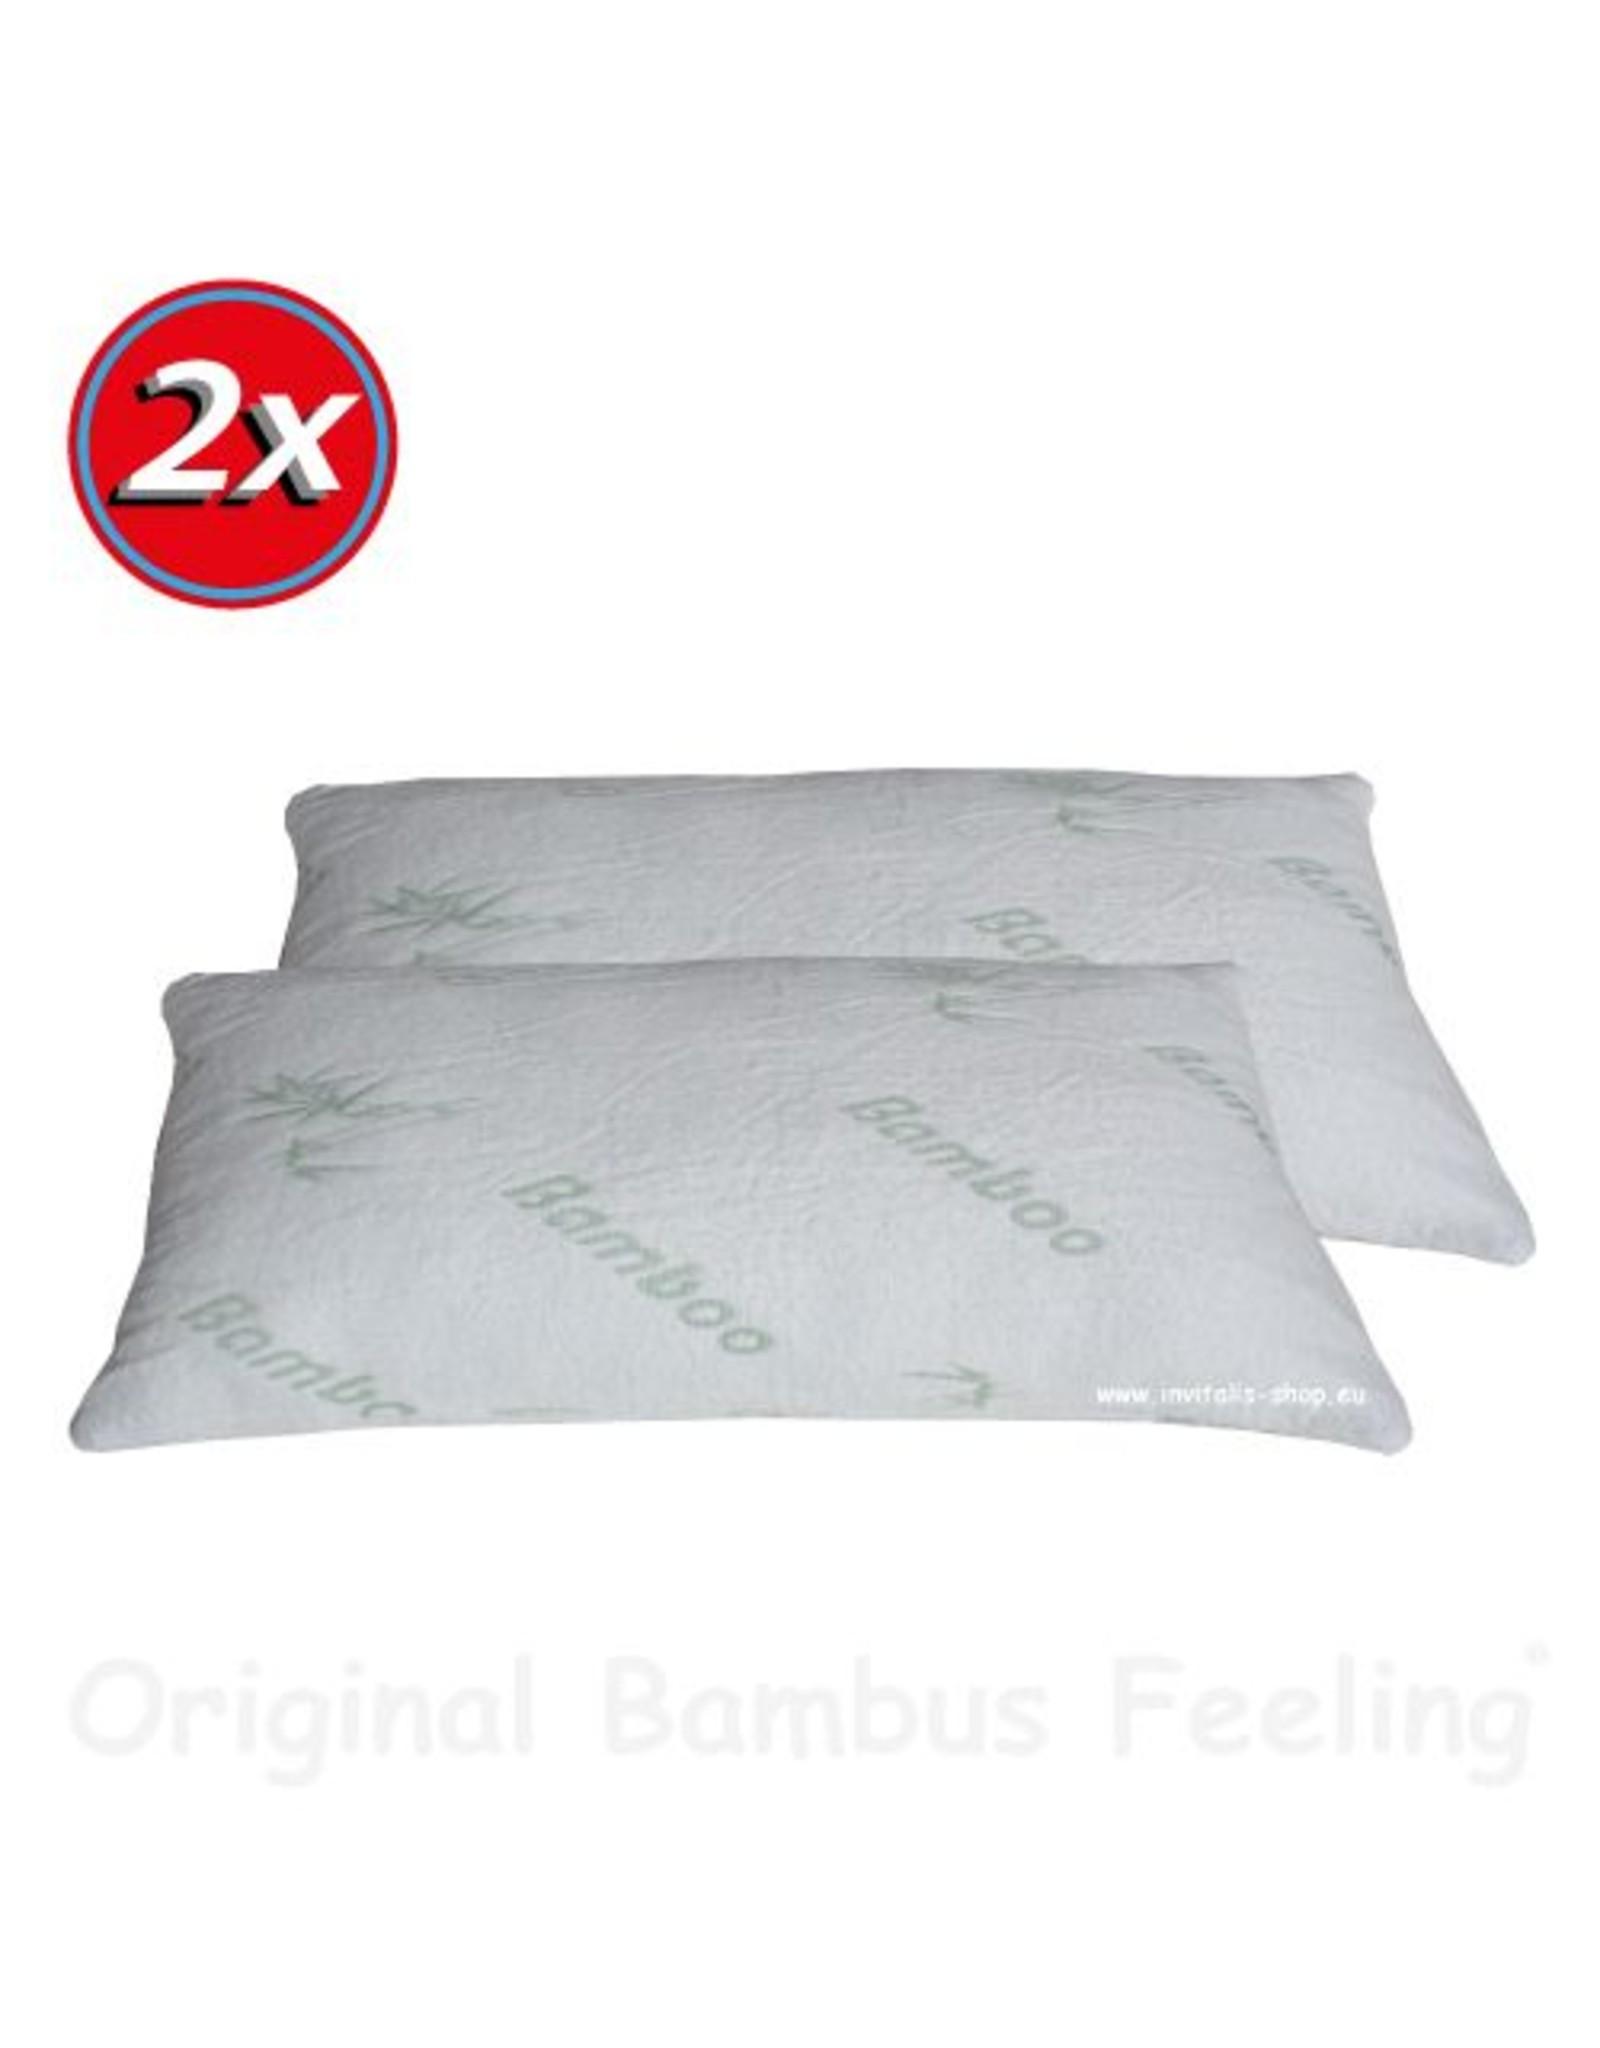 INVITALIS Bambus Kissen - 80x40cm 2er Sparset